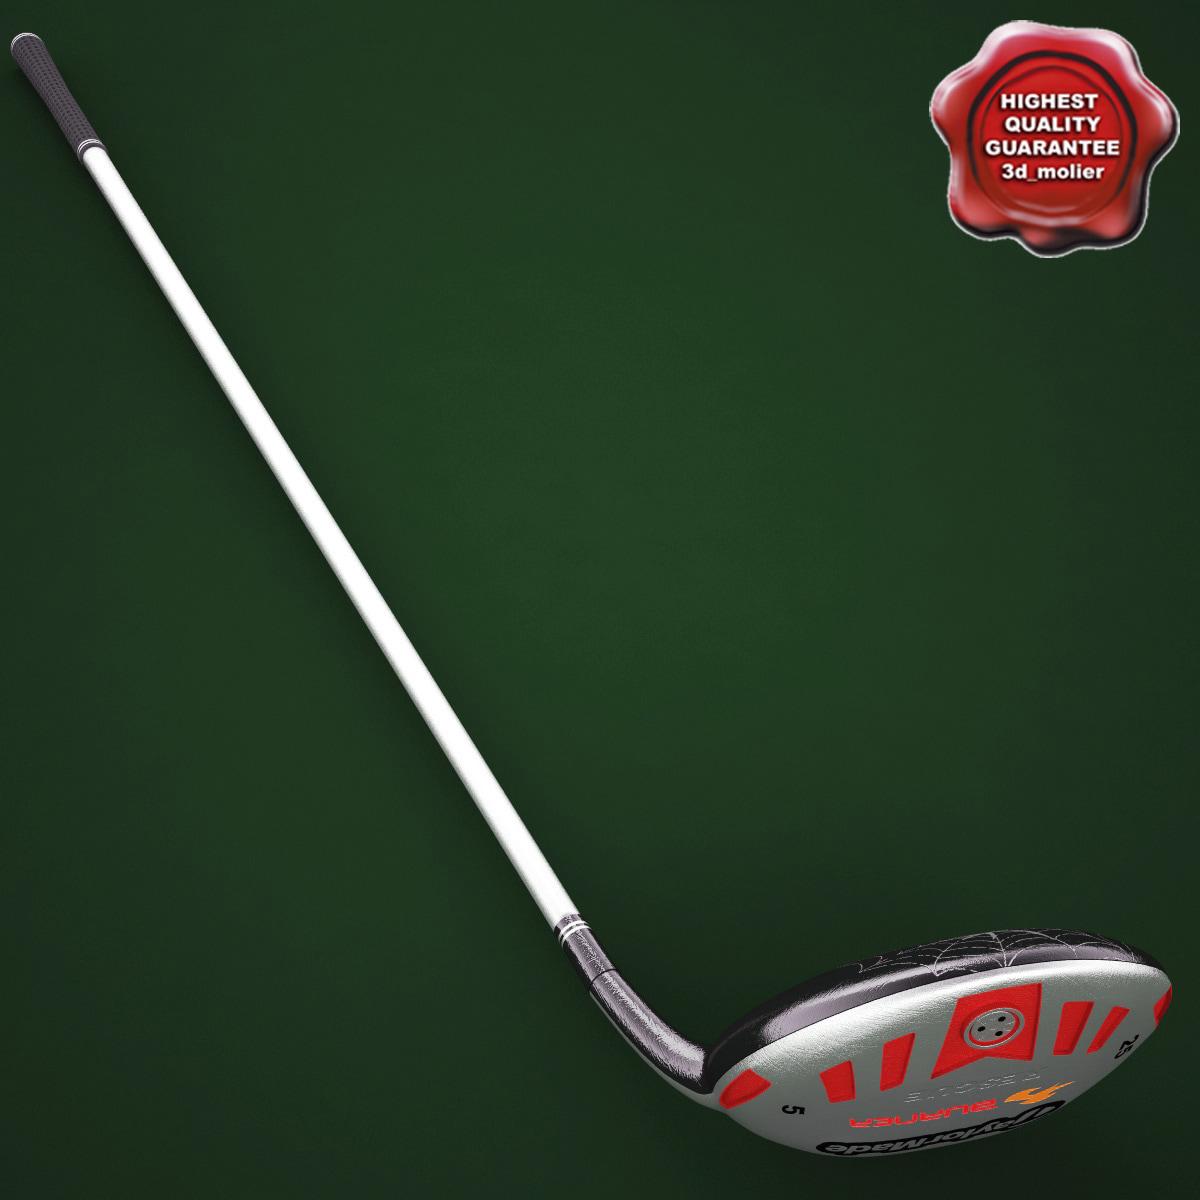 Golf_Stick_TaylorMade_Burner_Hybrid_00.jpg